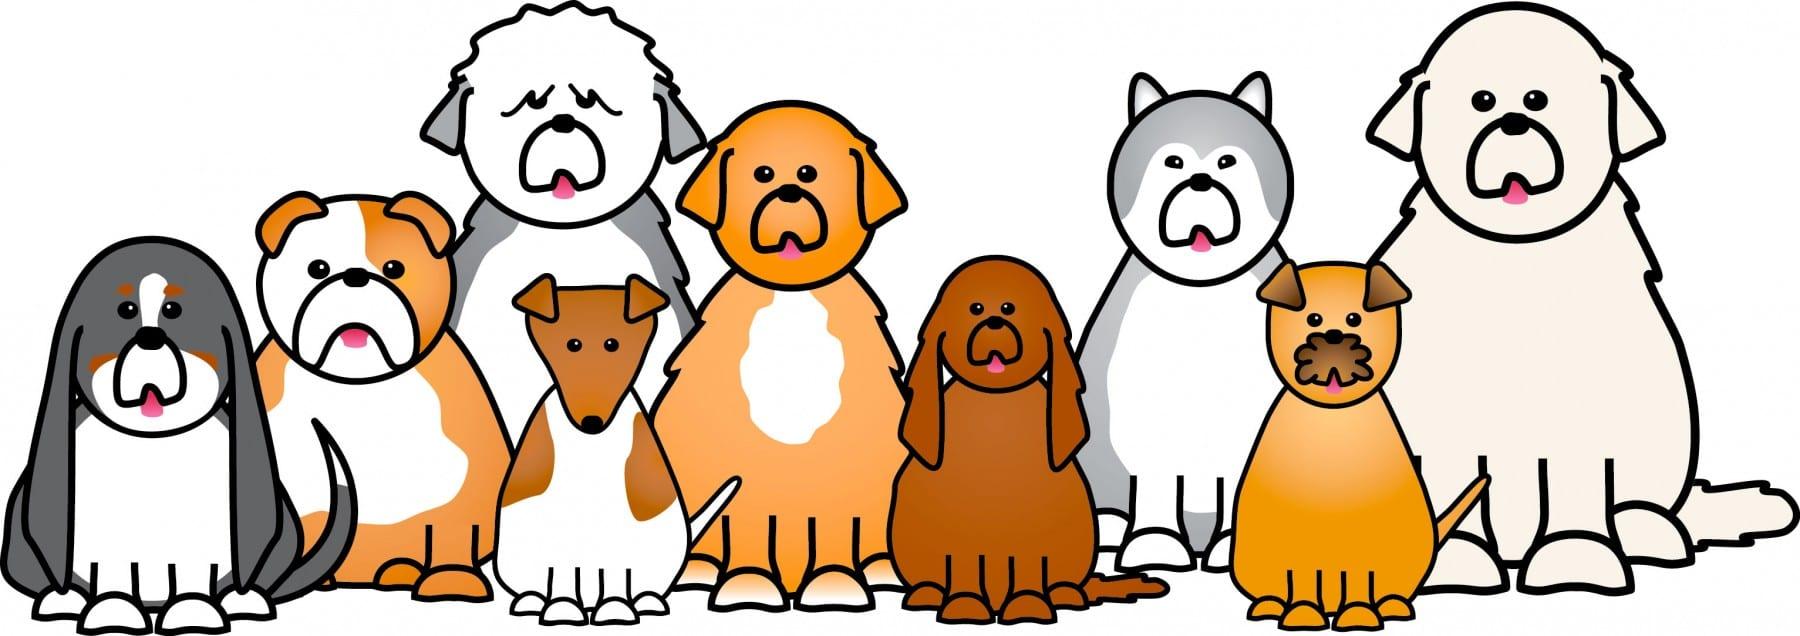 group-doodles